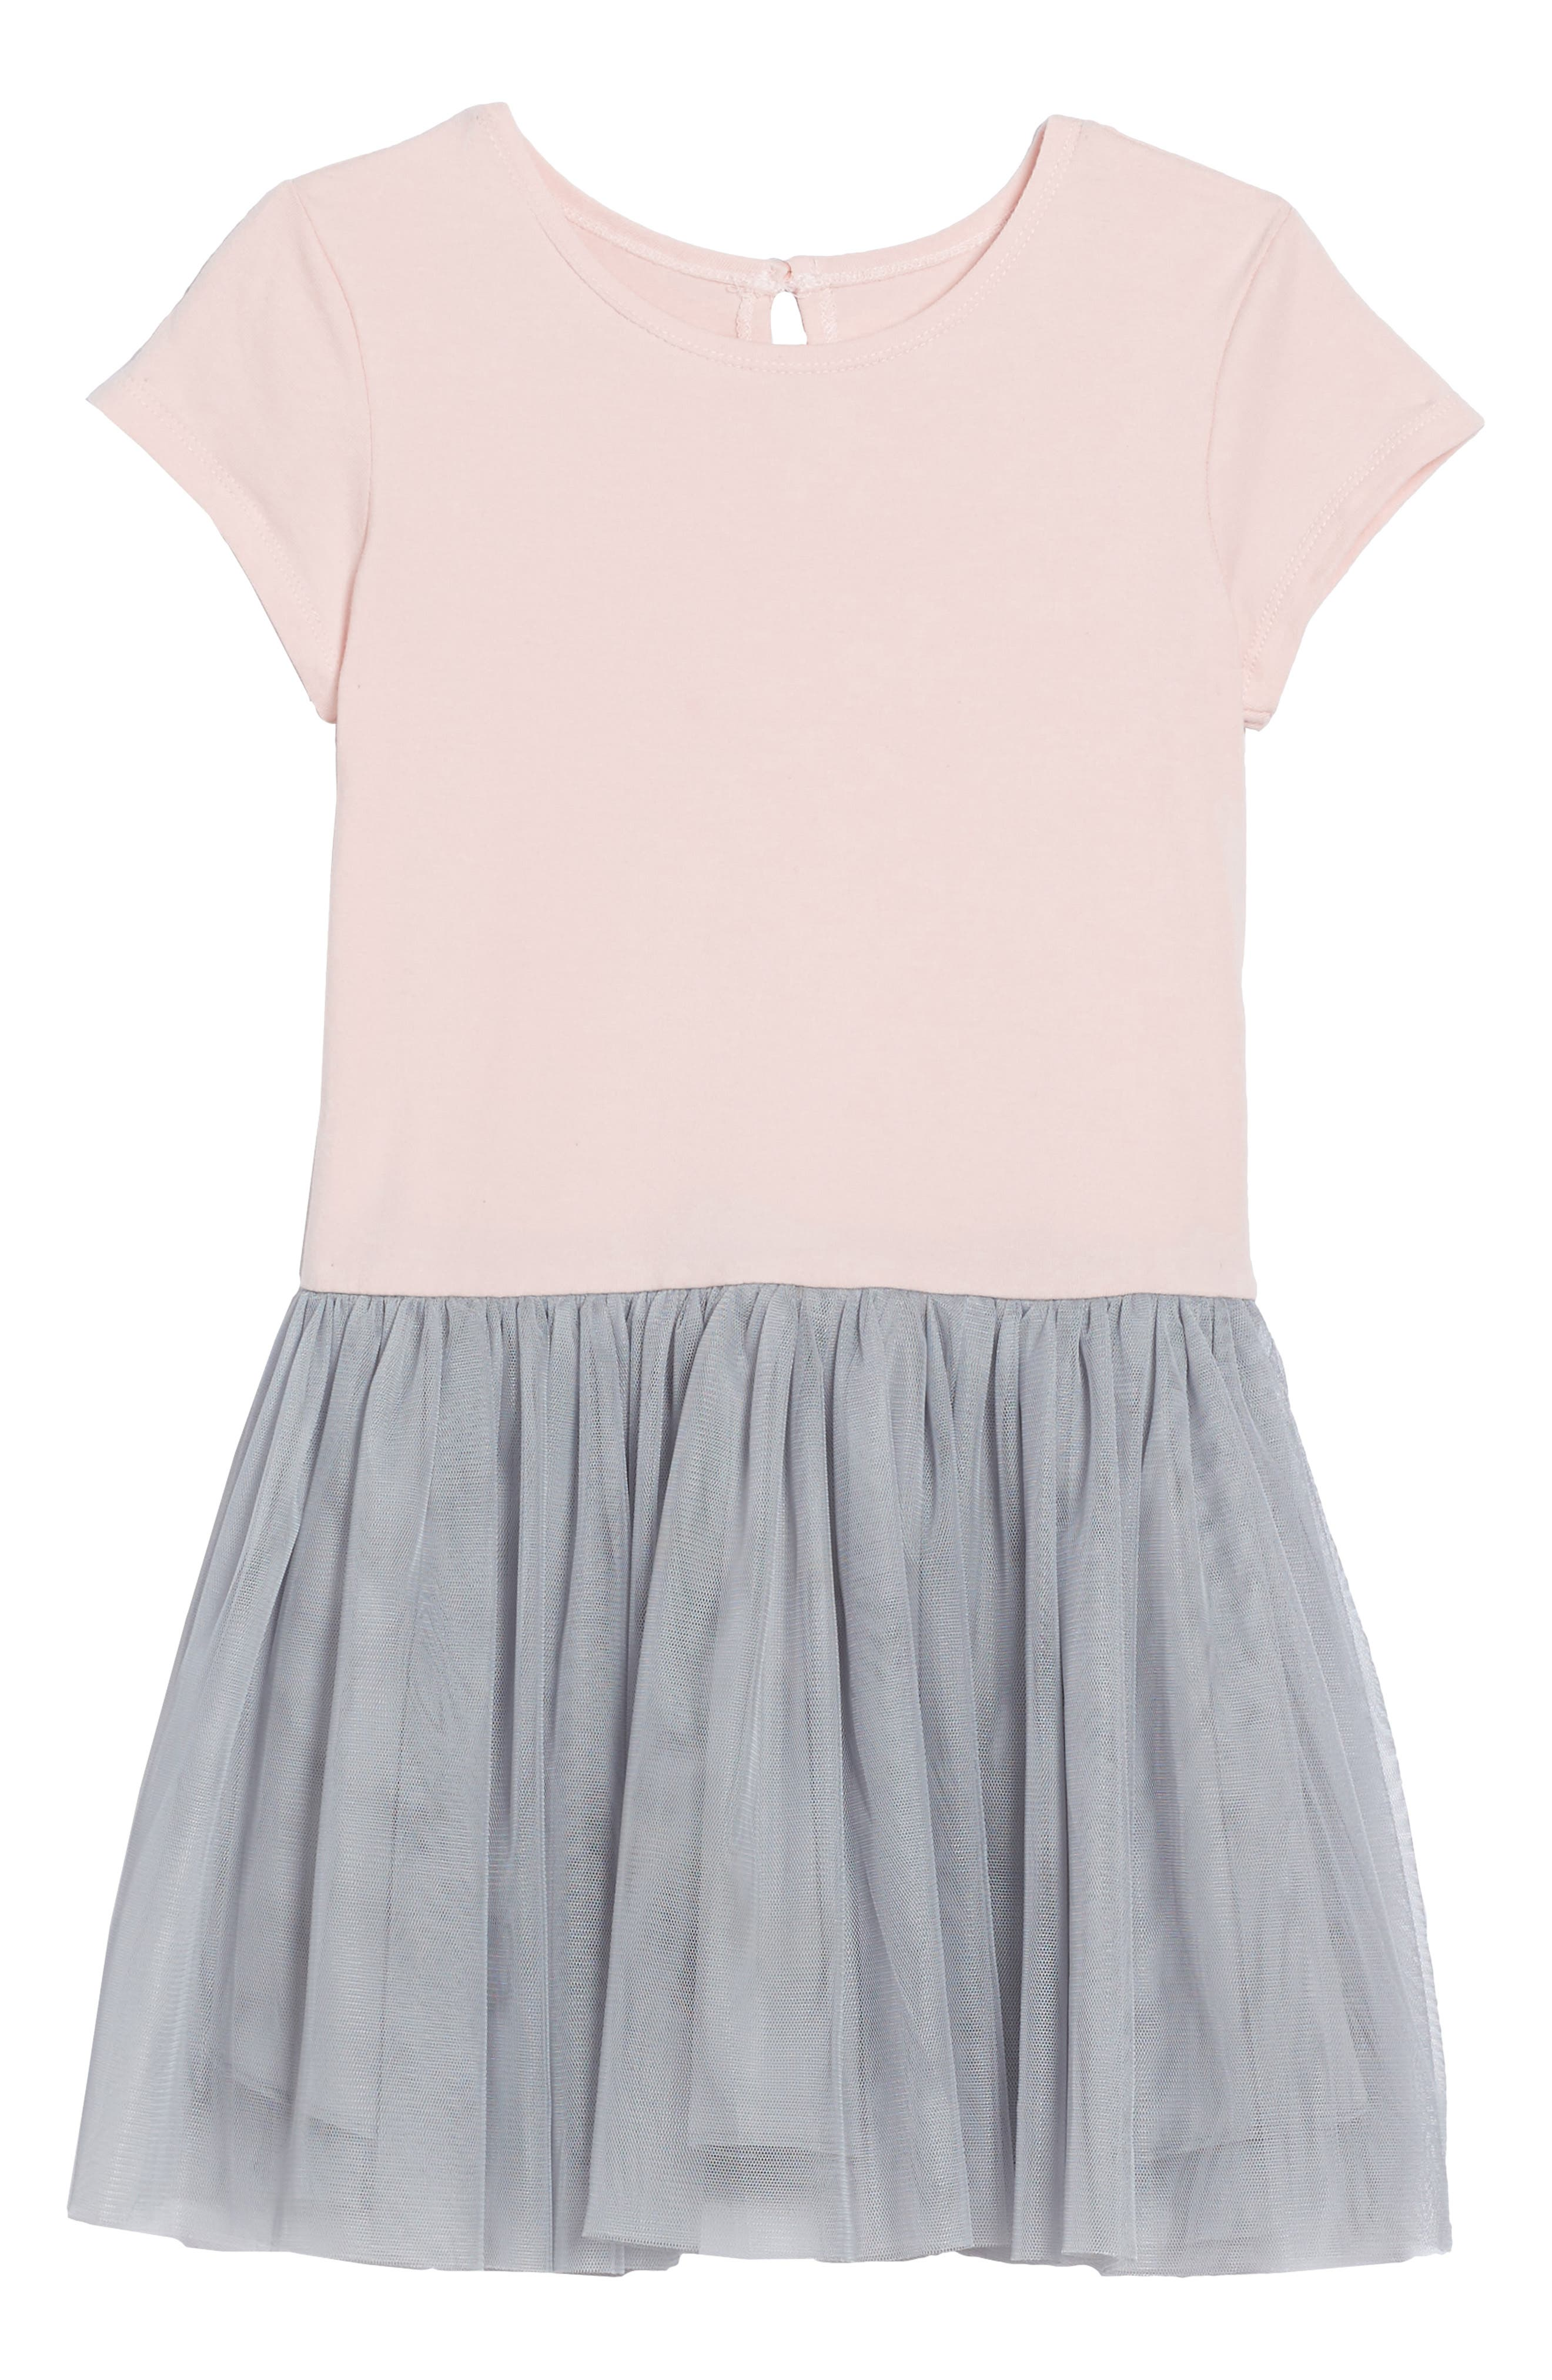 Alternate Image 3  - Pippa & Julie Tank Dress & Sequin Bomber Jacket Set (Toddler Girls, Little Girls & Big Girls)